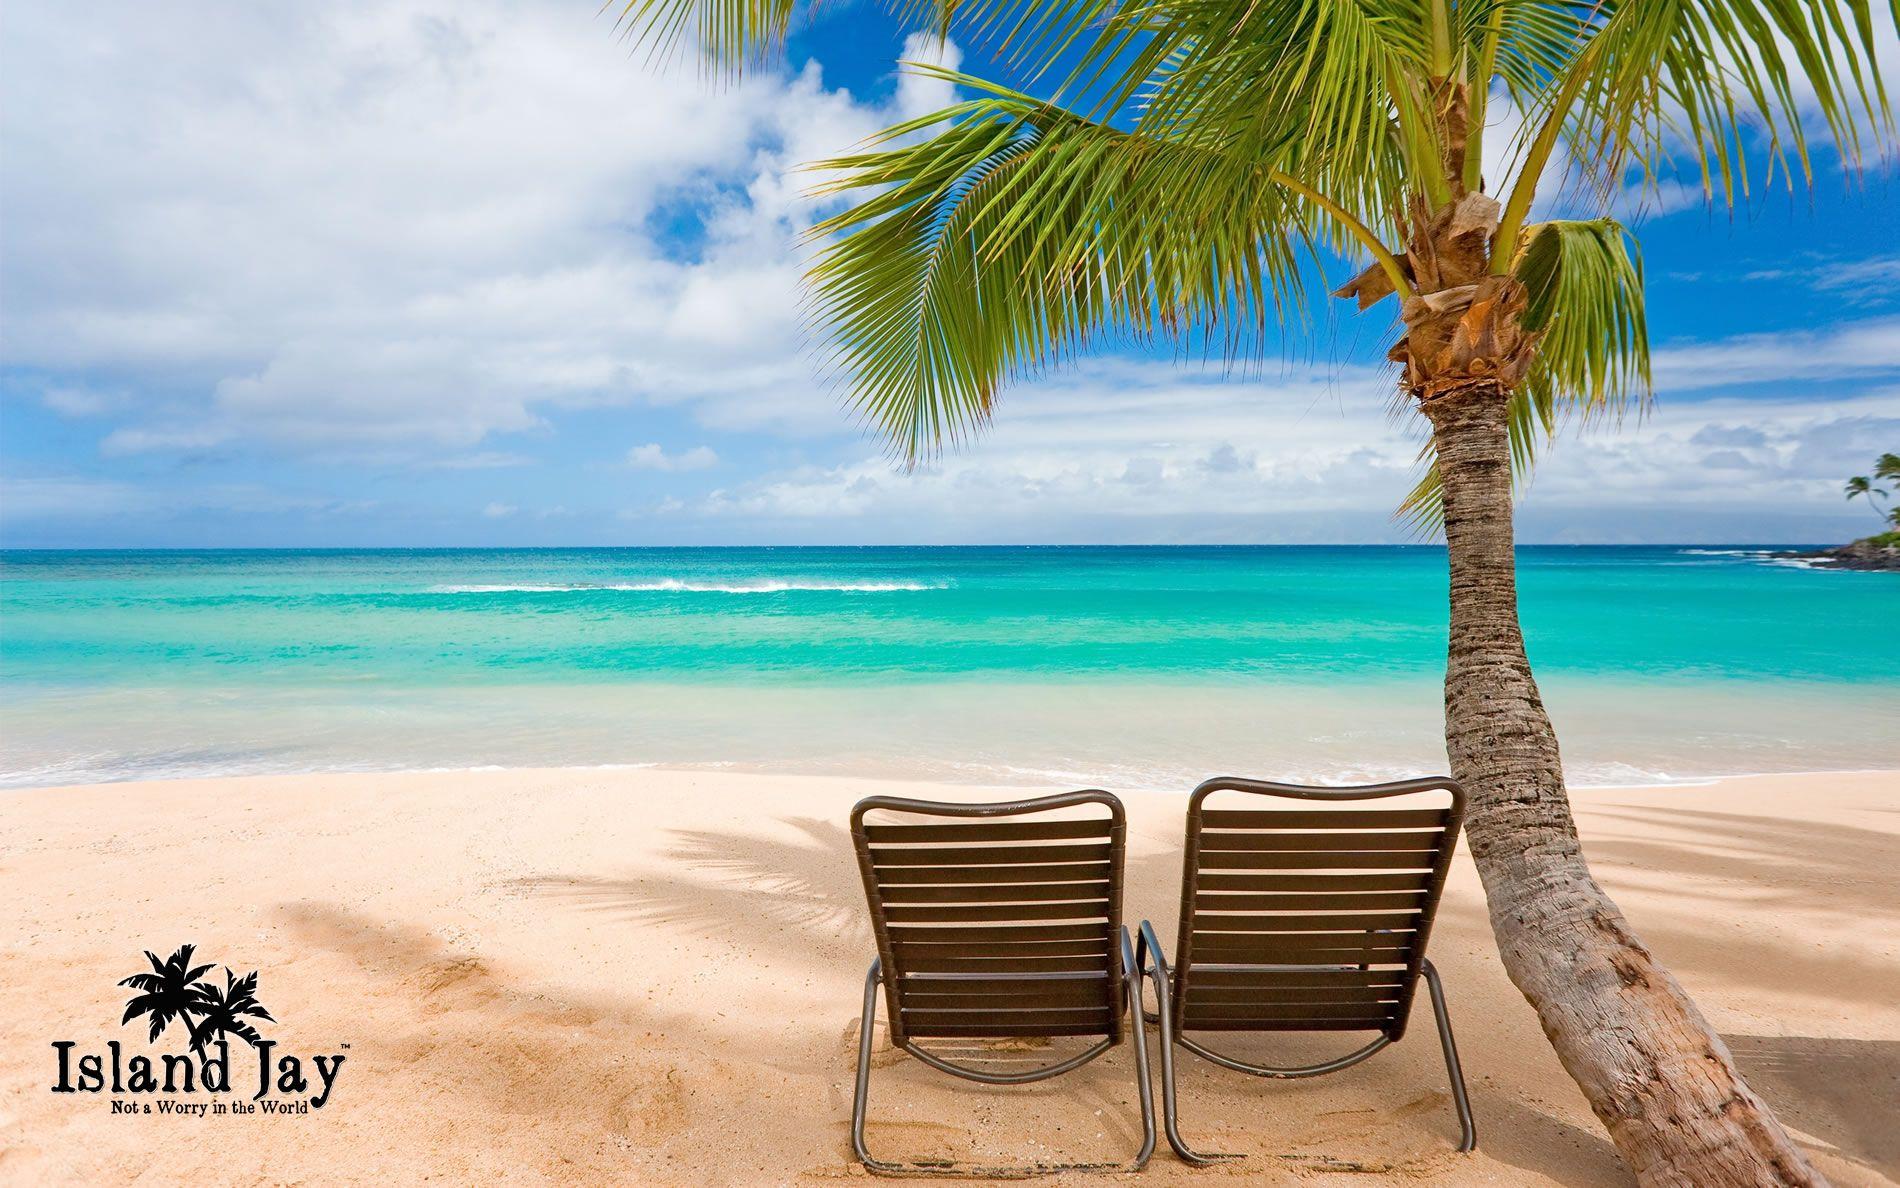 caribbean beach scenes | wallpaper – empty beach chairs on the ocean